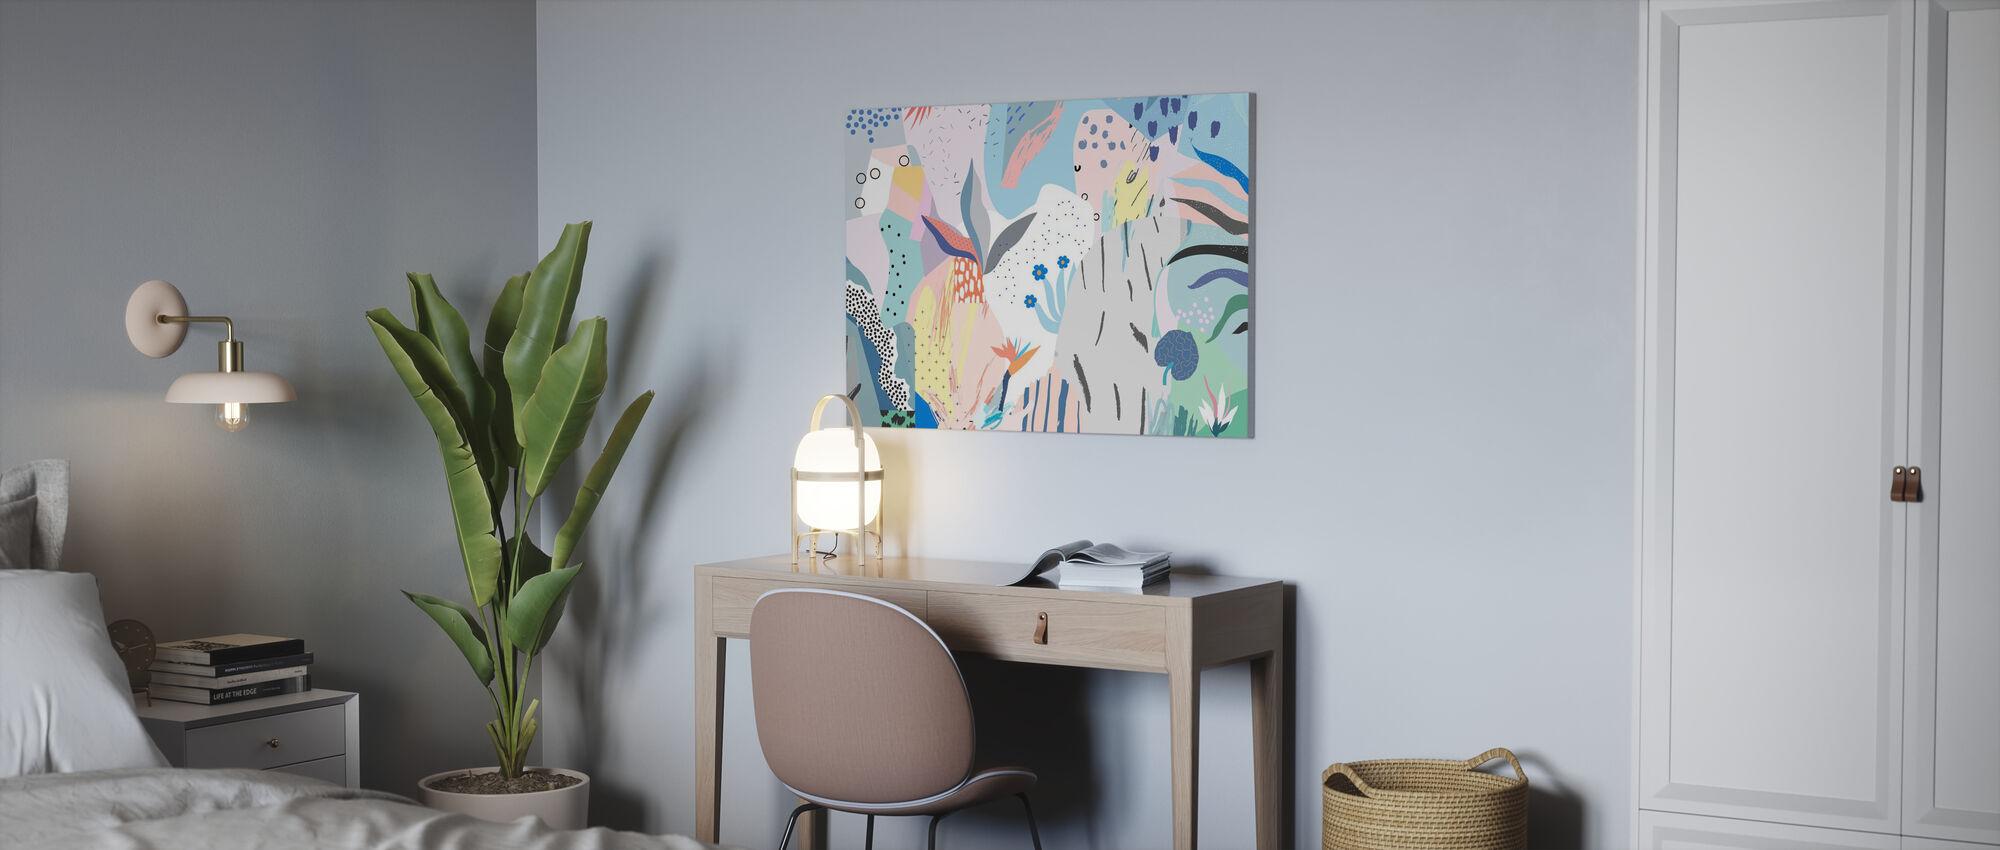 Blommig - Canvastavla - Kontor